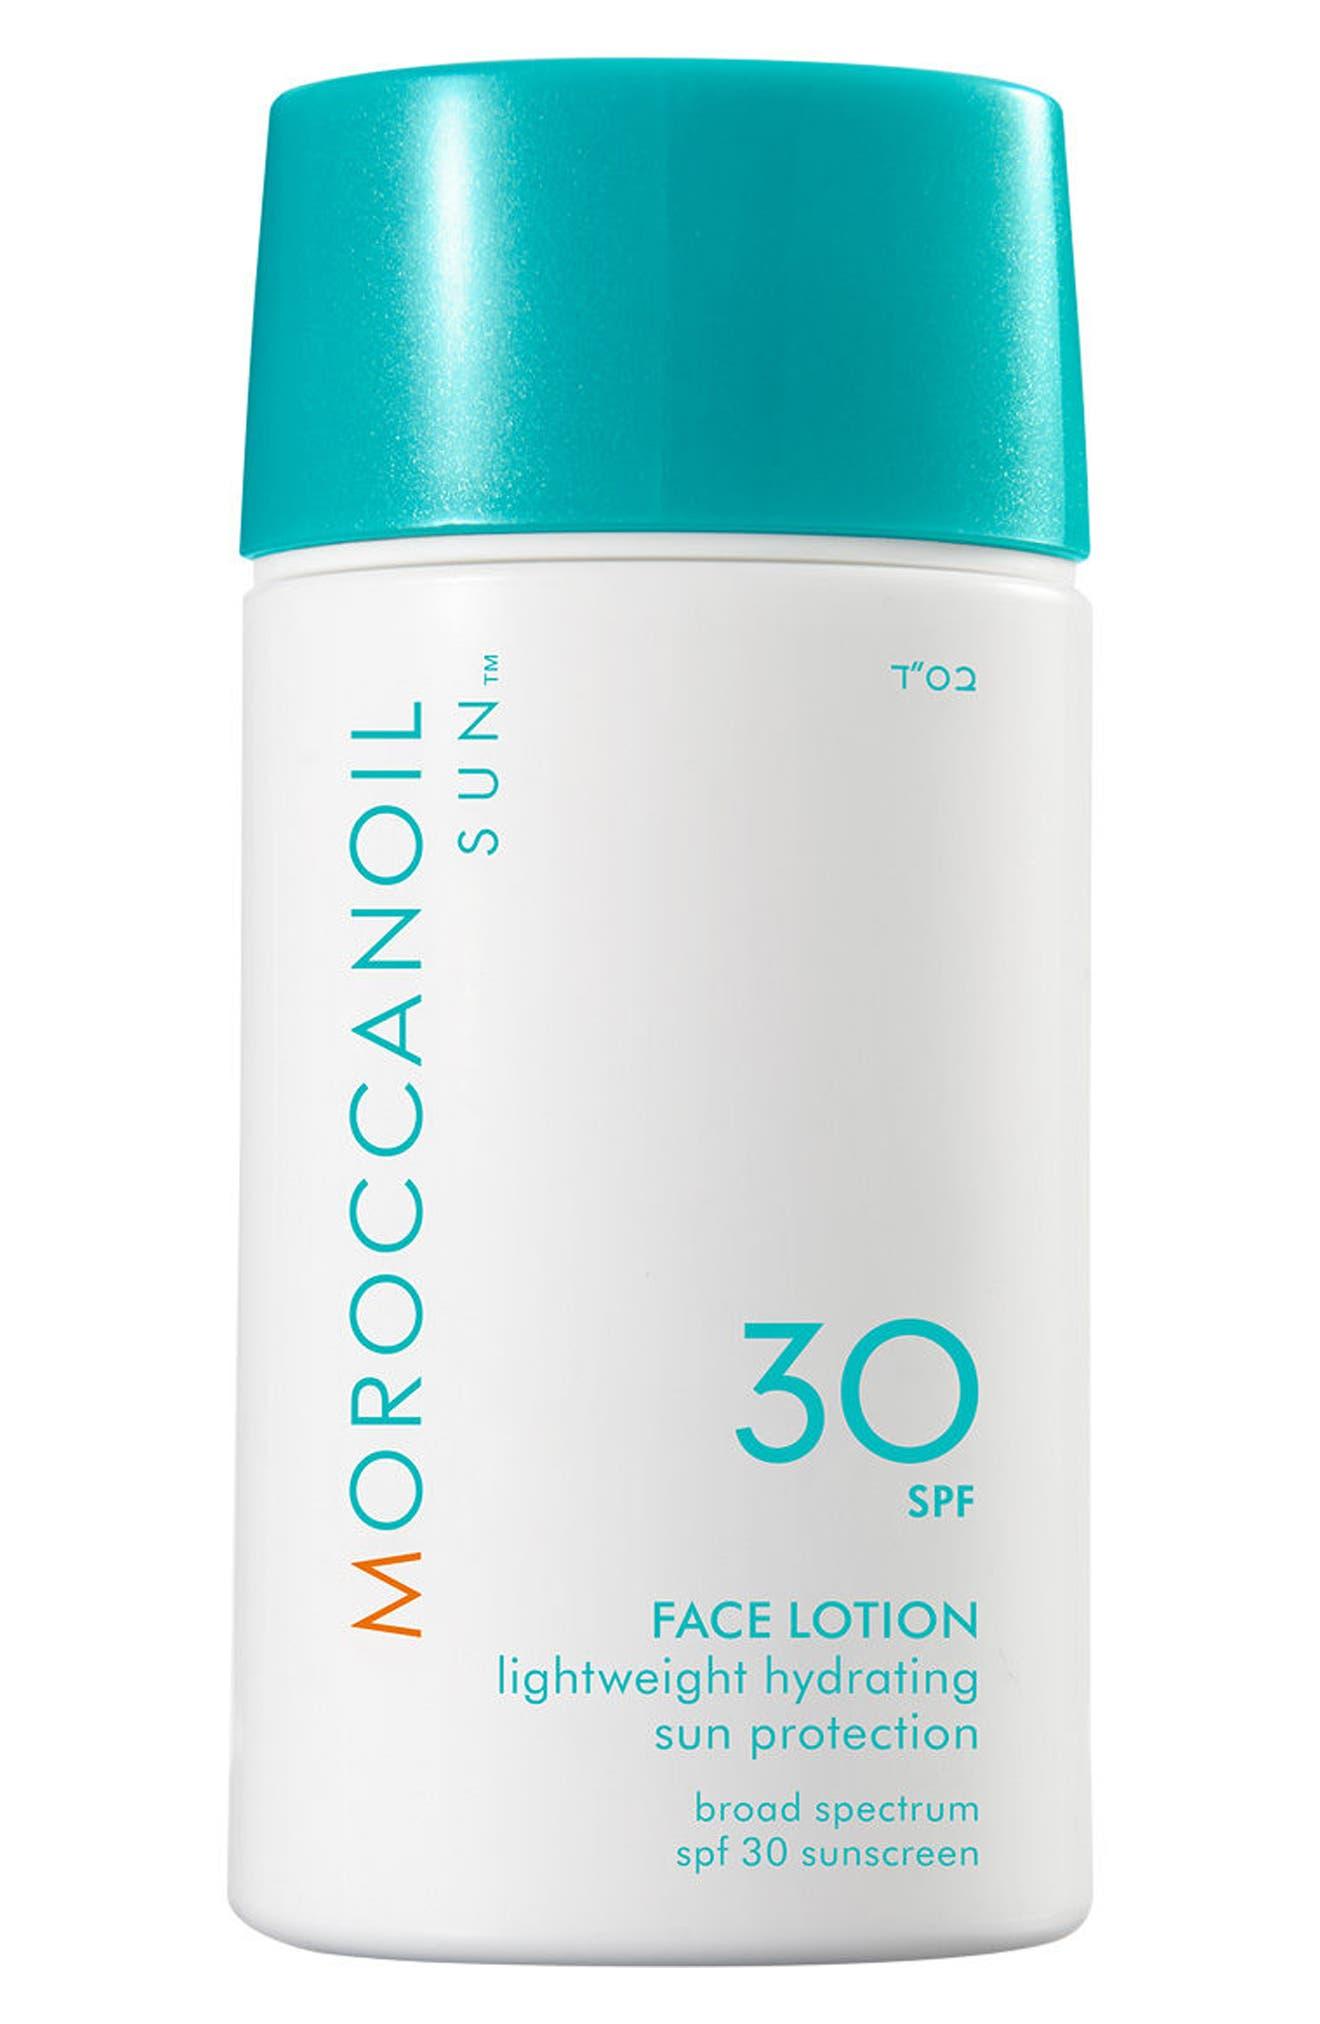 MOROCCANOIL® Face Lotion SPF 30